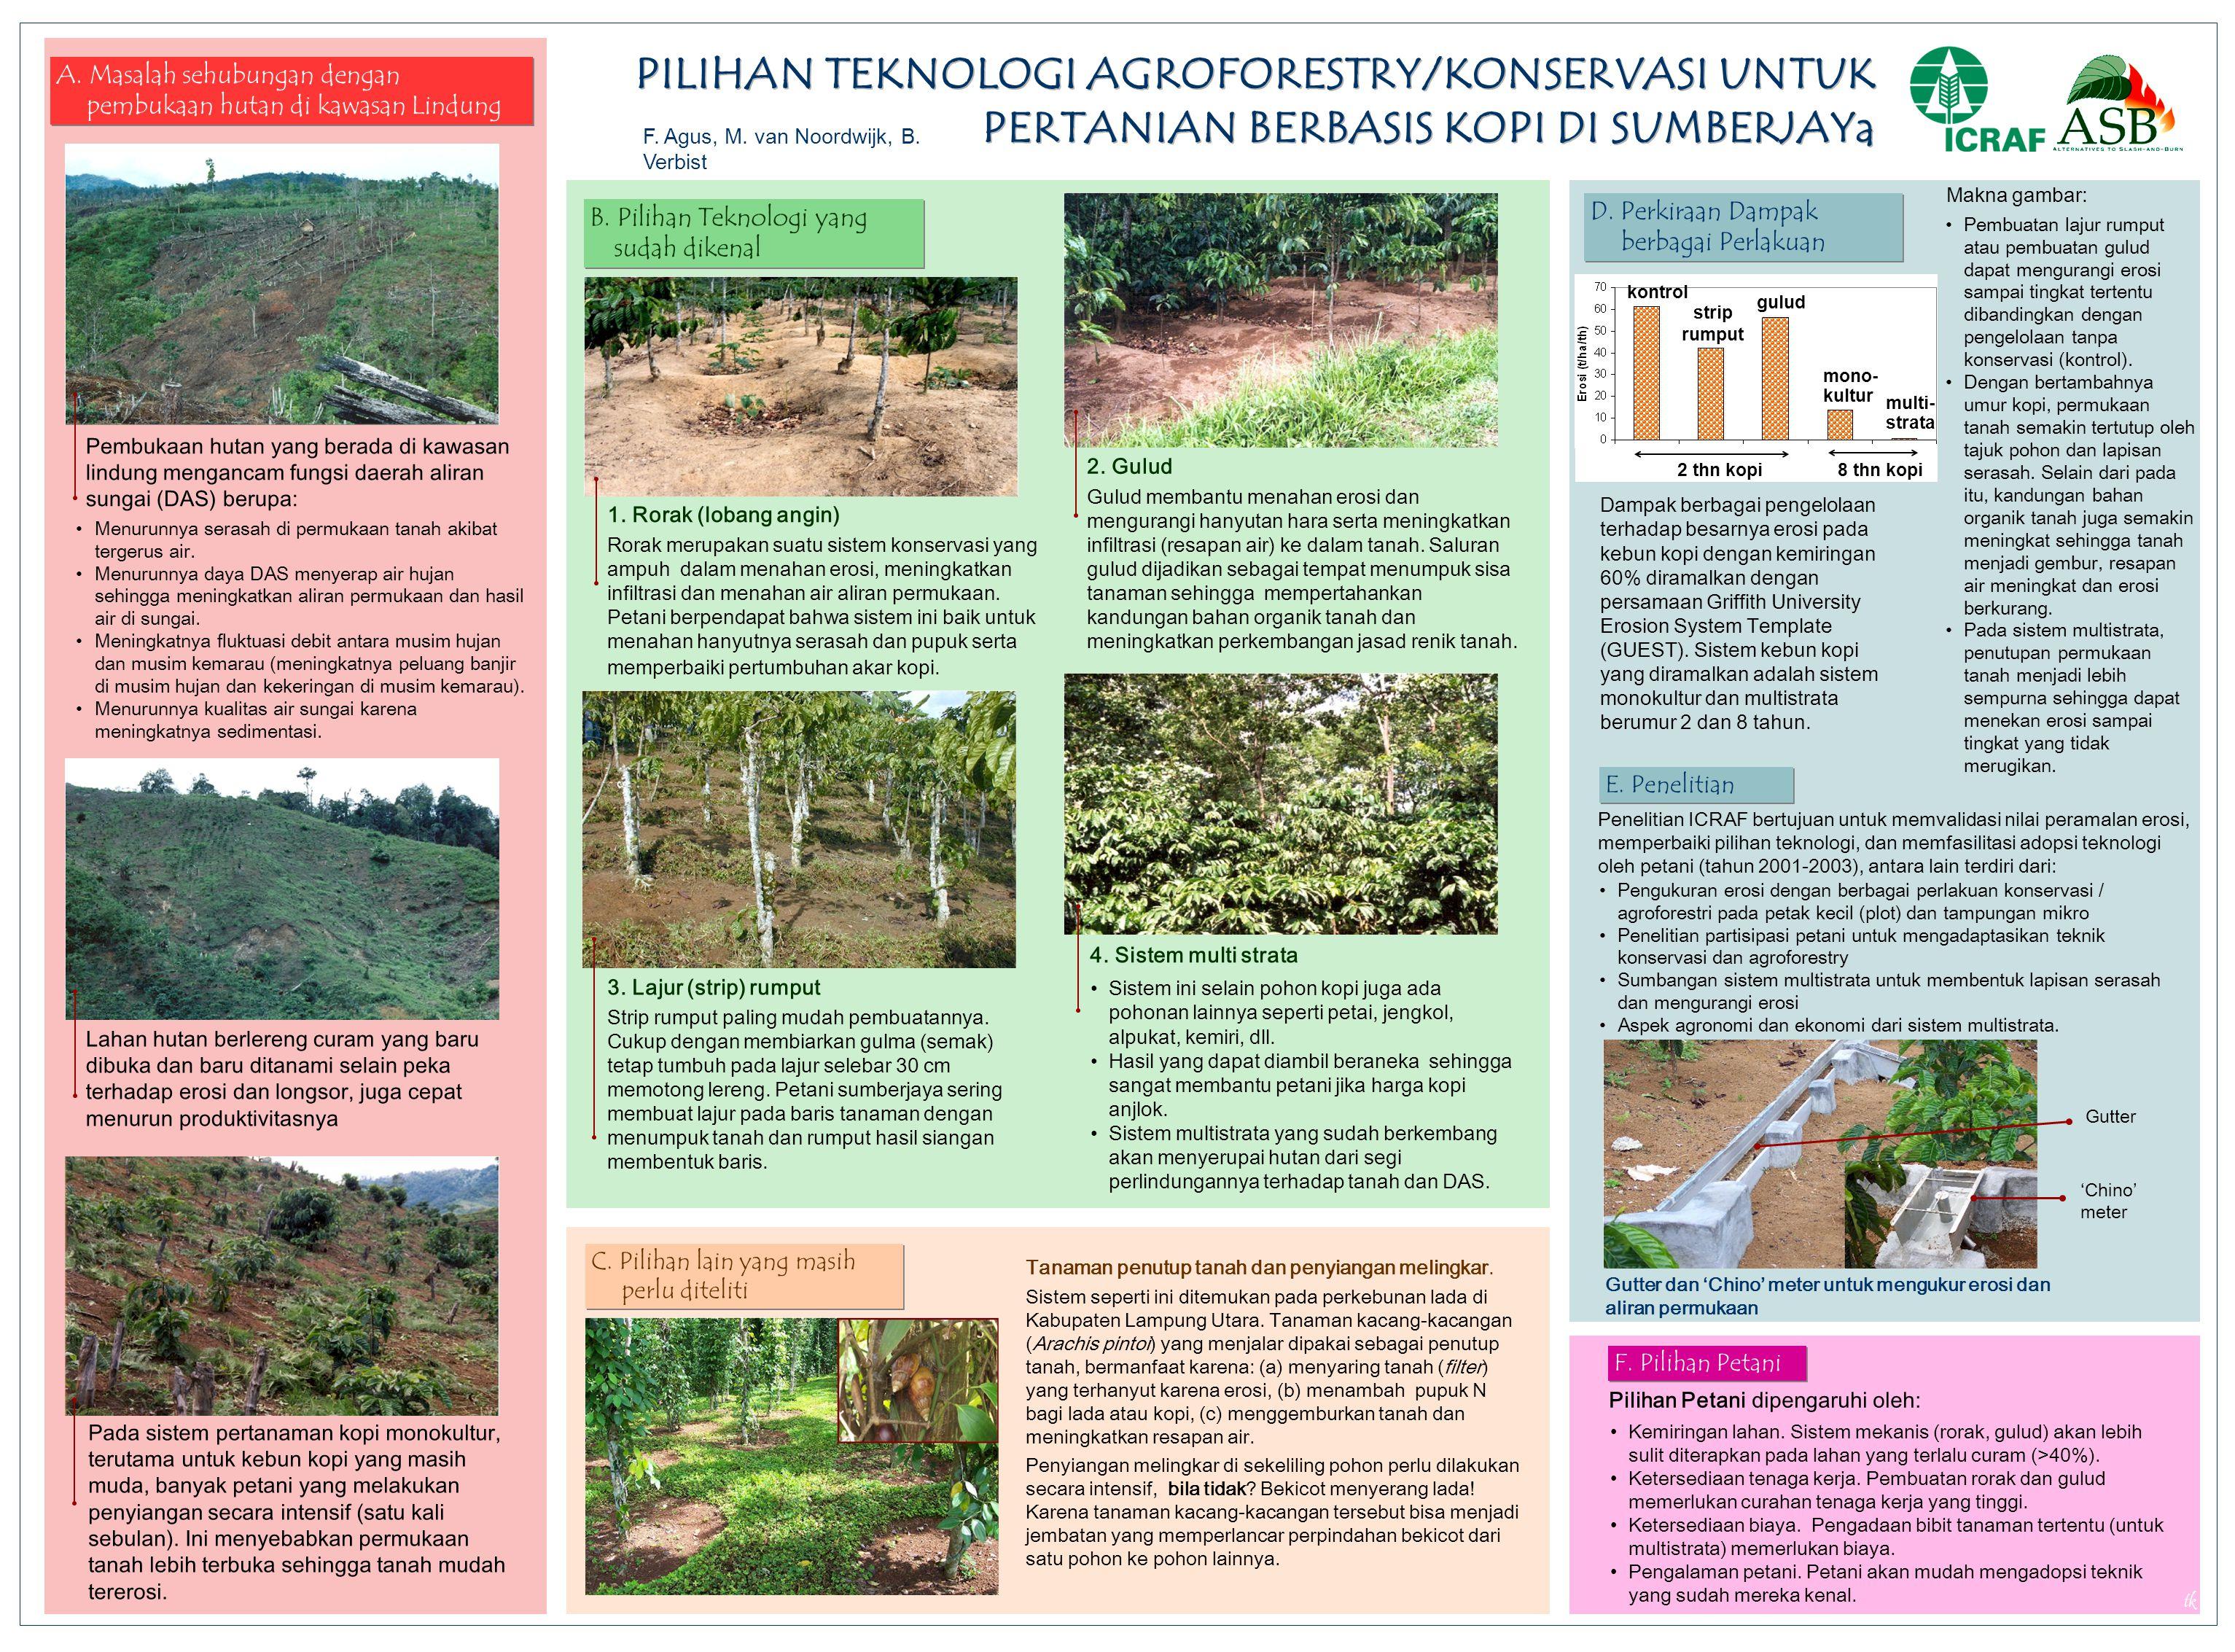 Lahan hutan berlereng curam yang baru dibuka dan baru ditanami selain peka terhadap erosi dan longsor, juga cepat menurun produktivitasnya Pada sistem